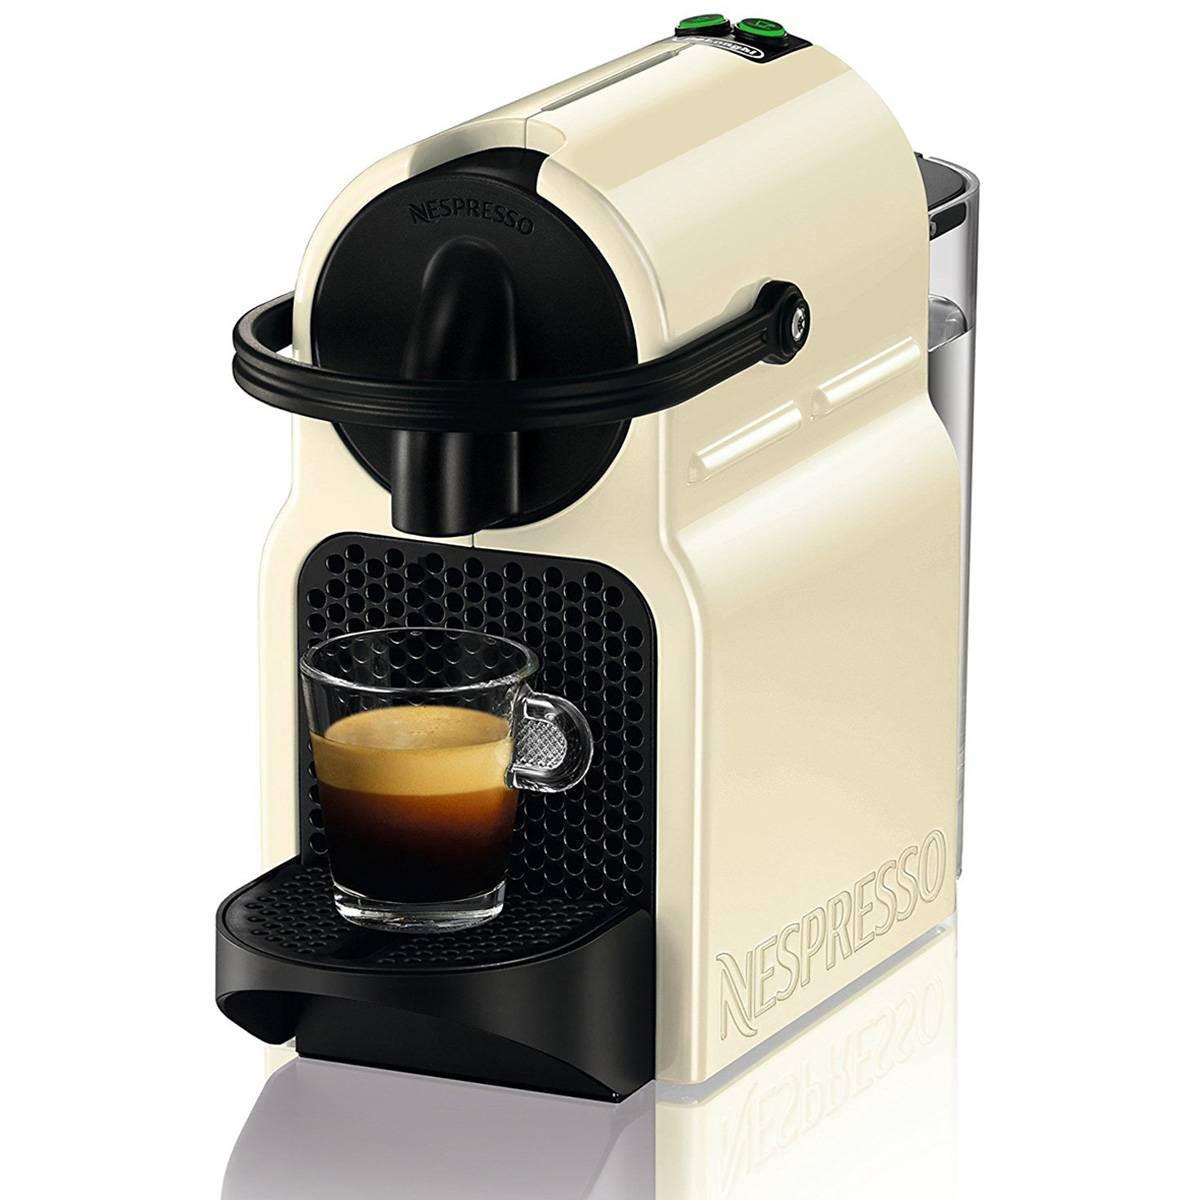 Delonghi - Cafetera Nespresso Inissia EN 80 CW 19 bares automática crema